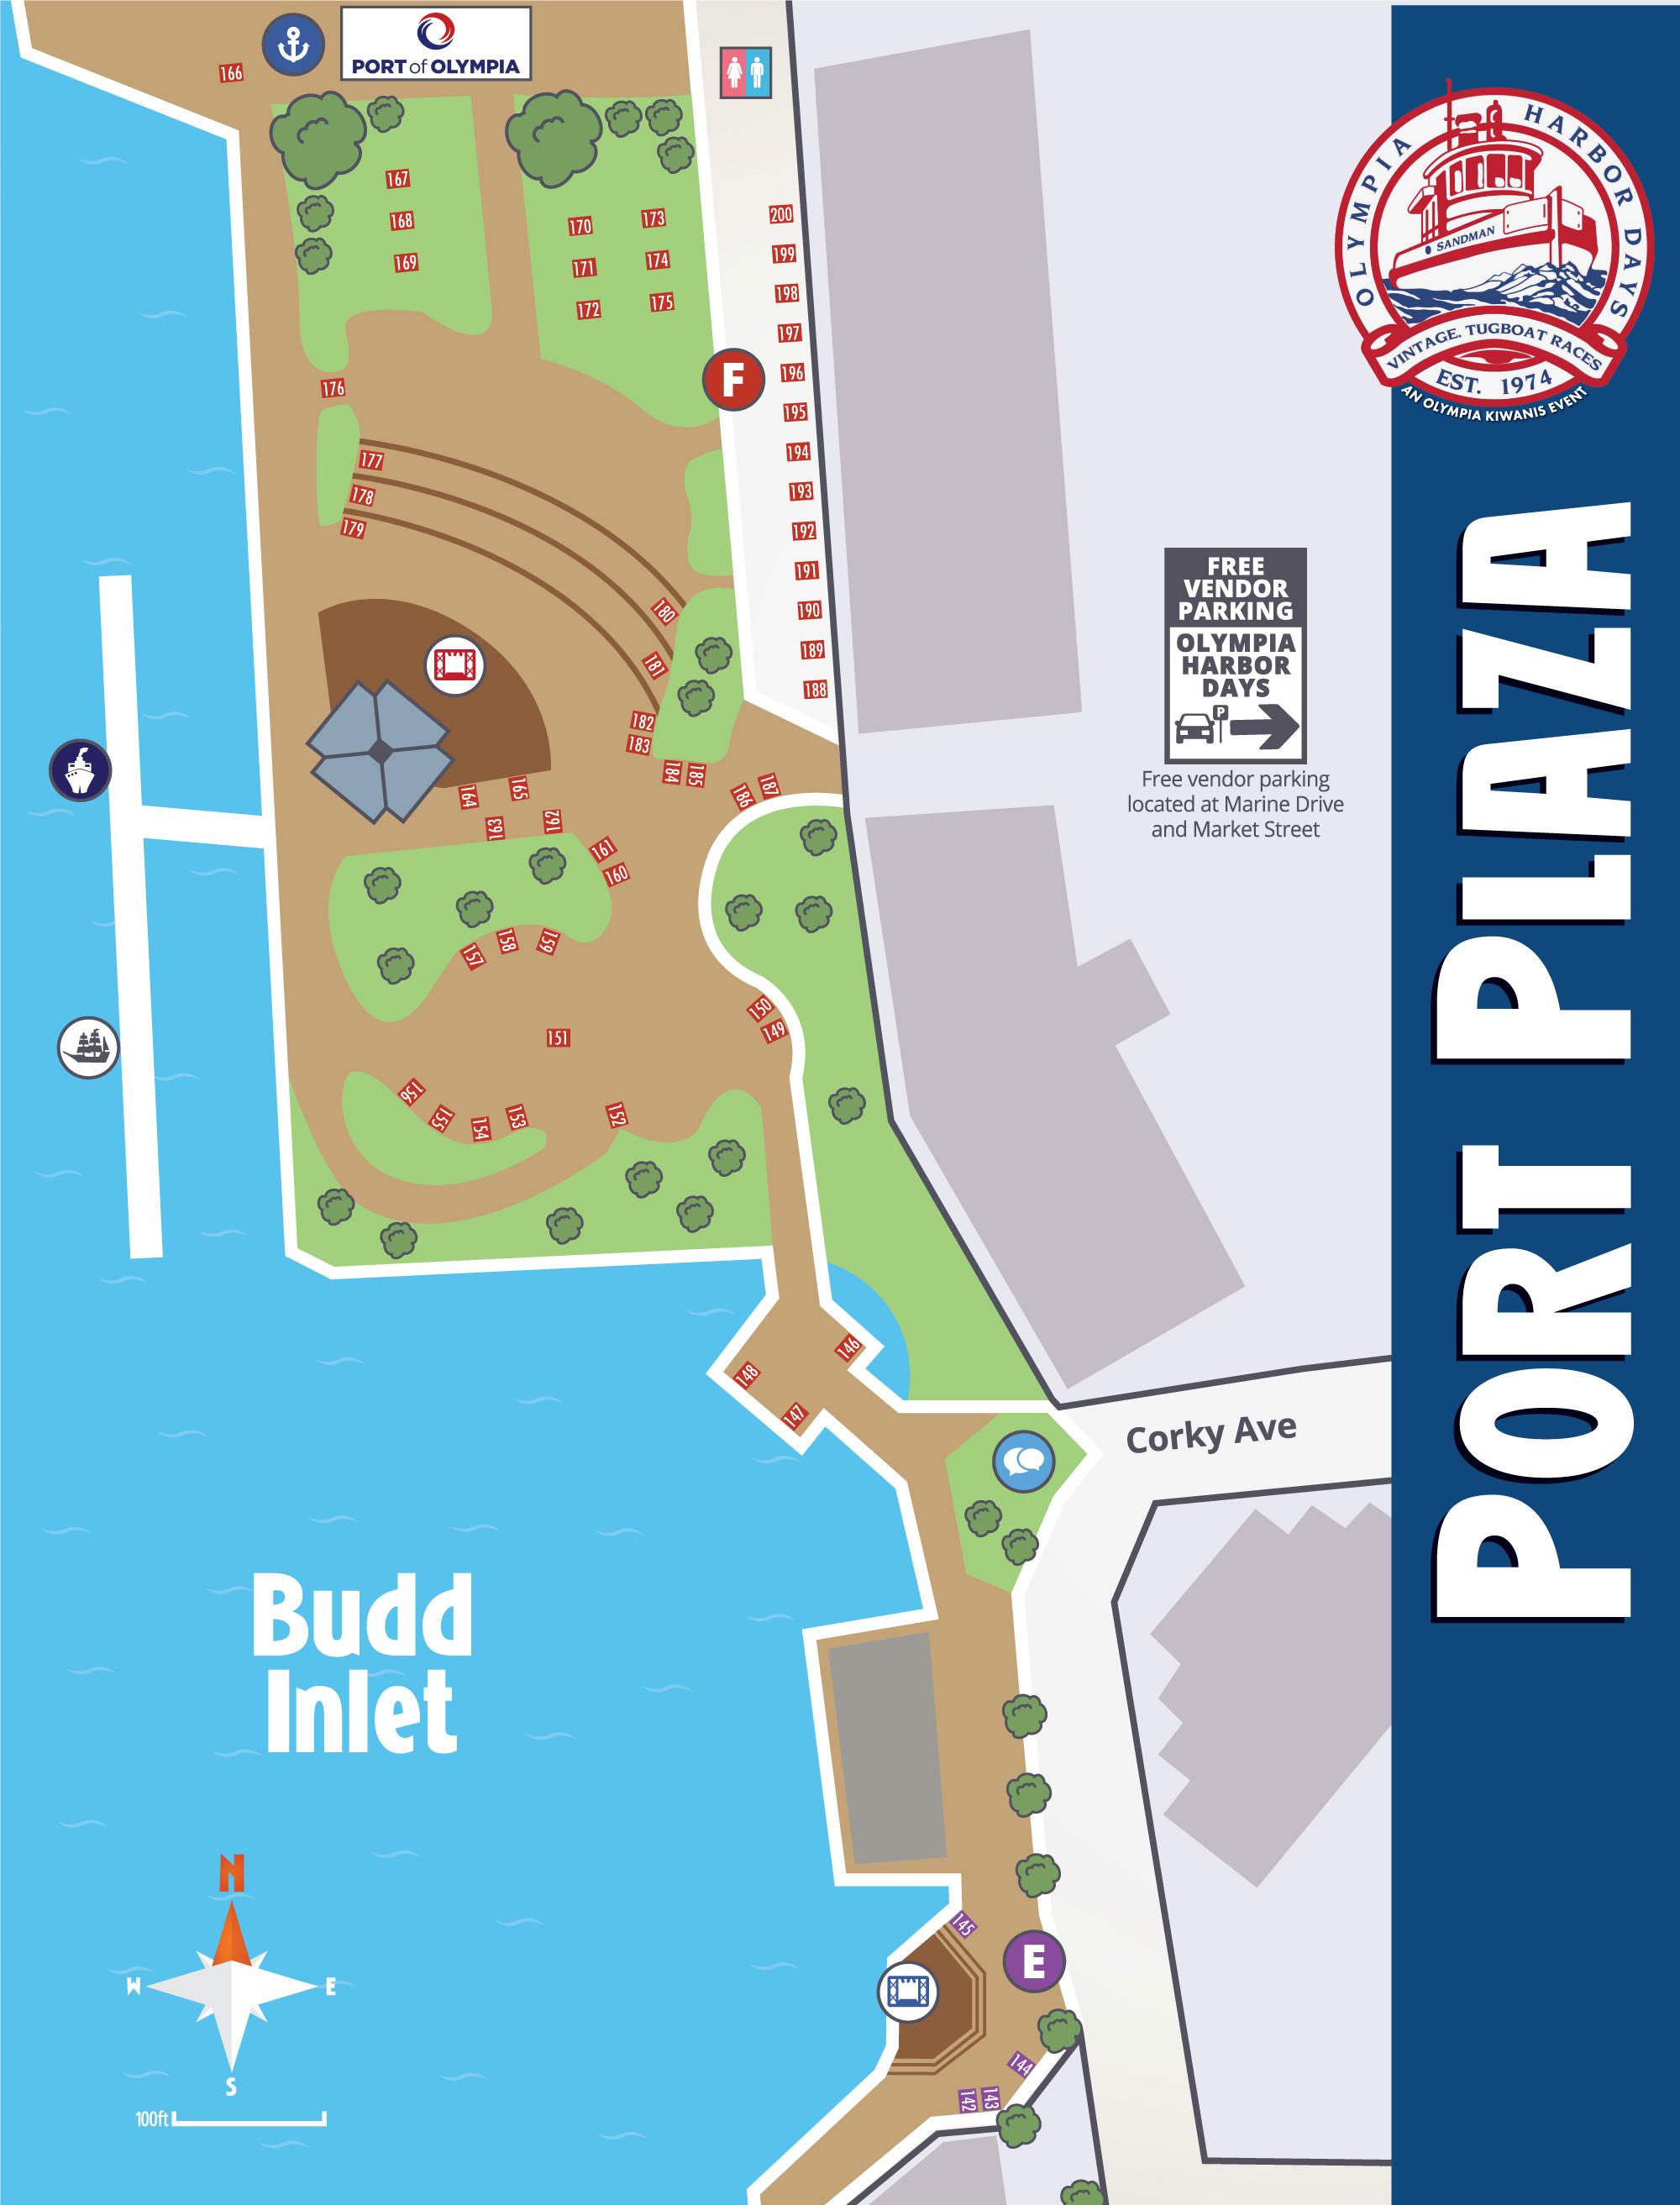 OHD_Vendor Map_Port-Plaza_FINAL_2019.7.28v2.jpg